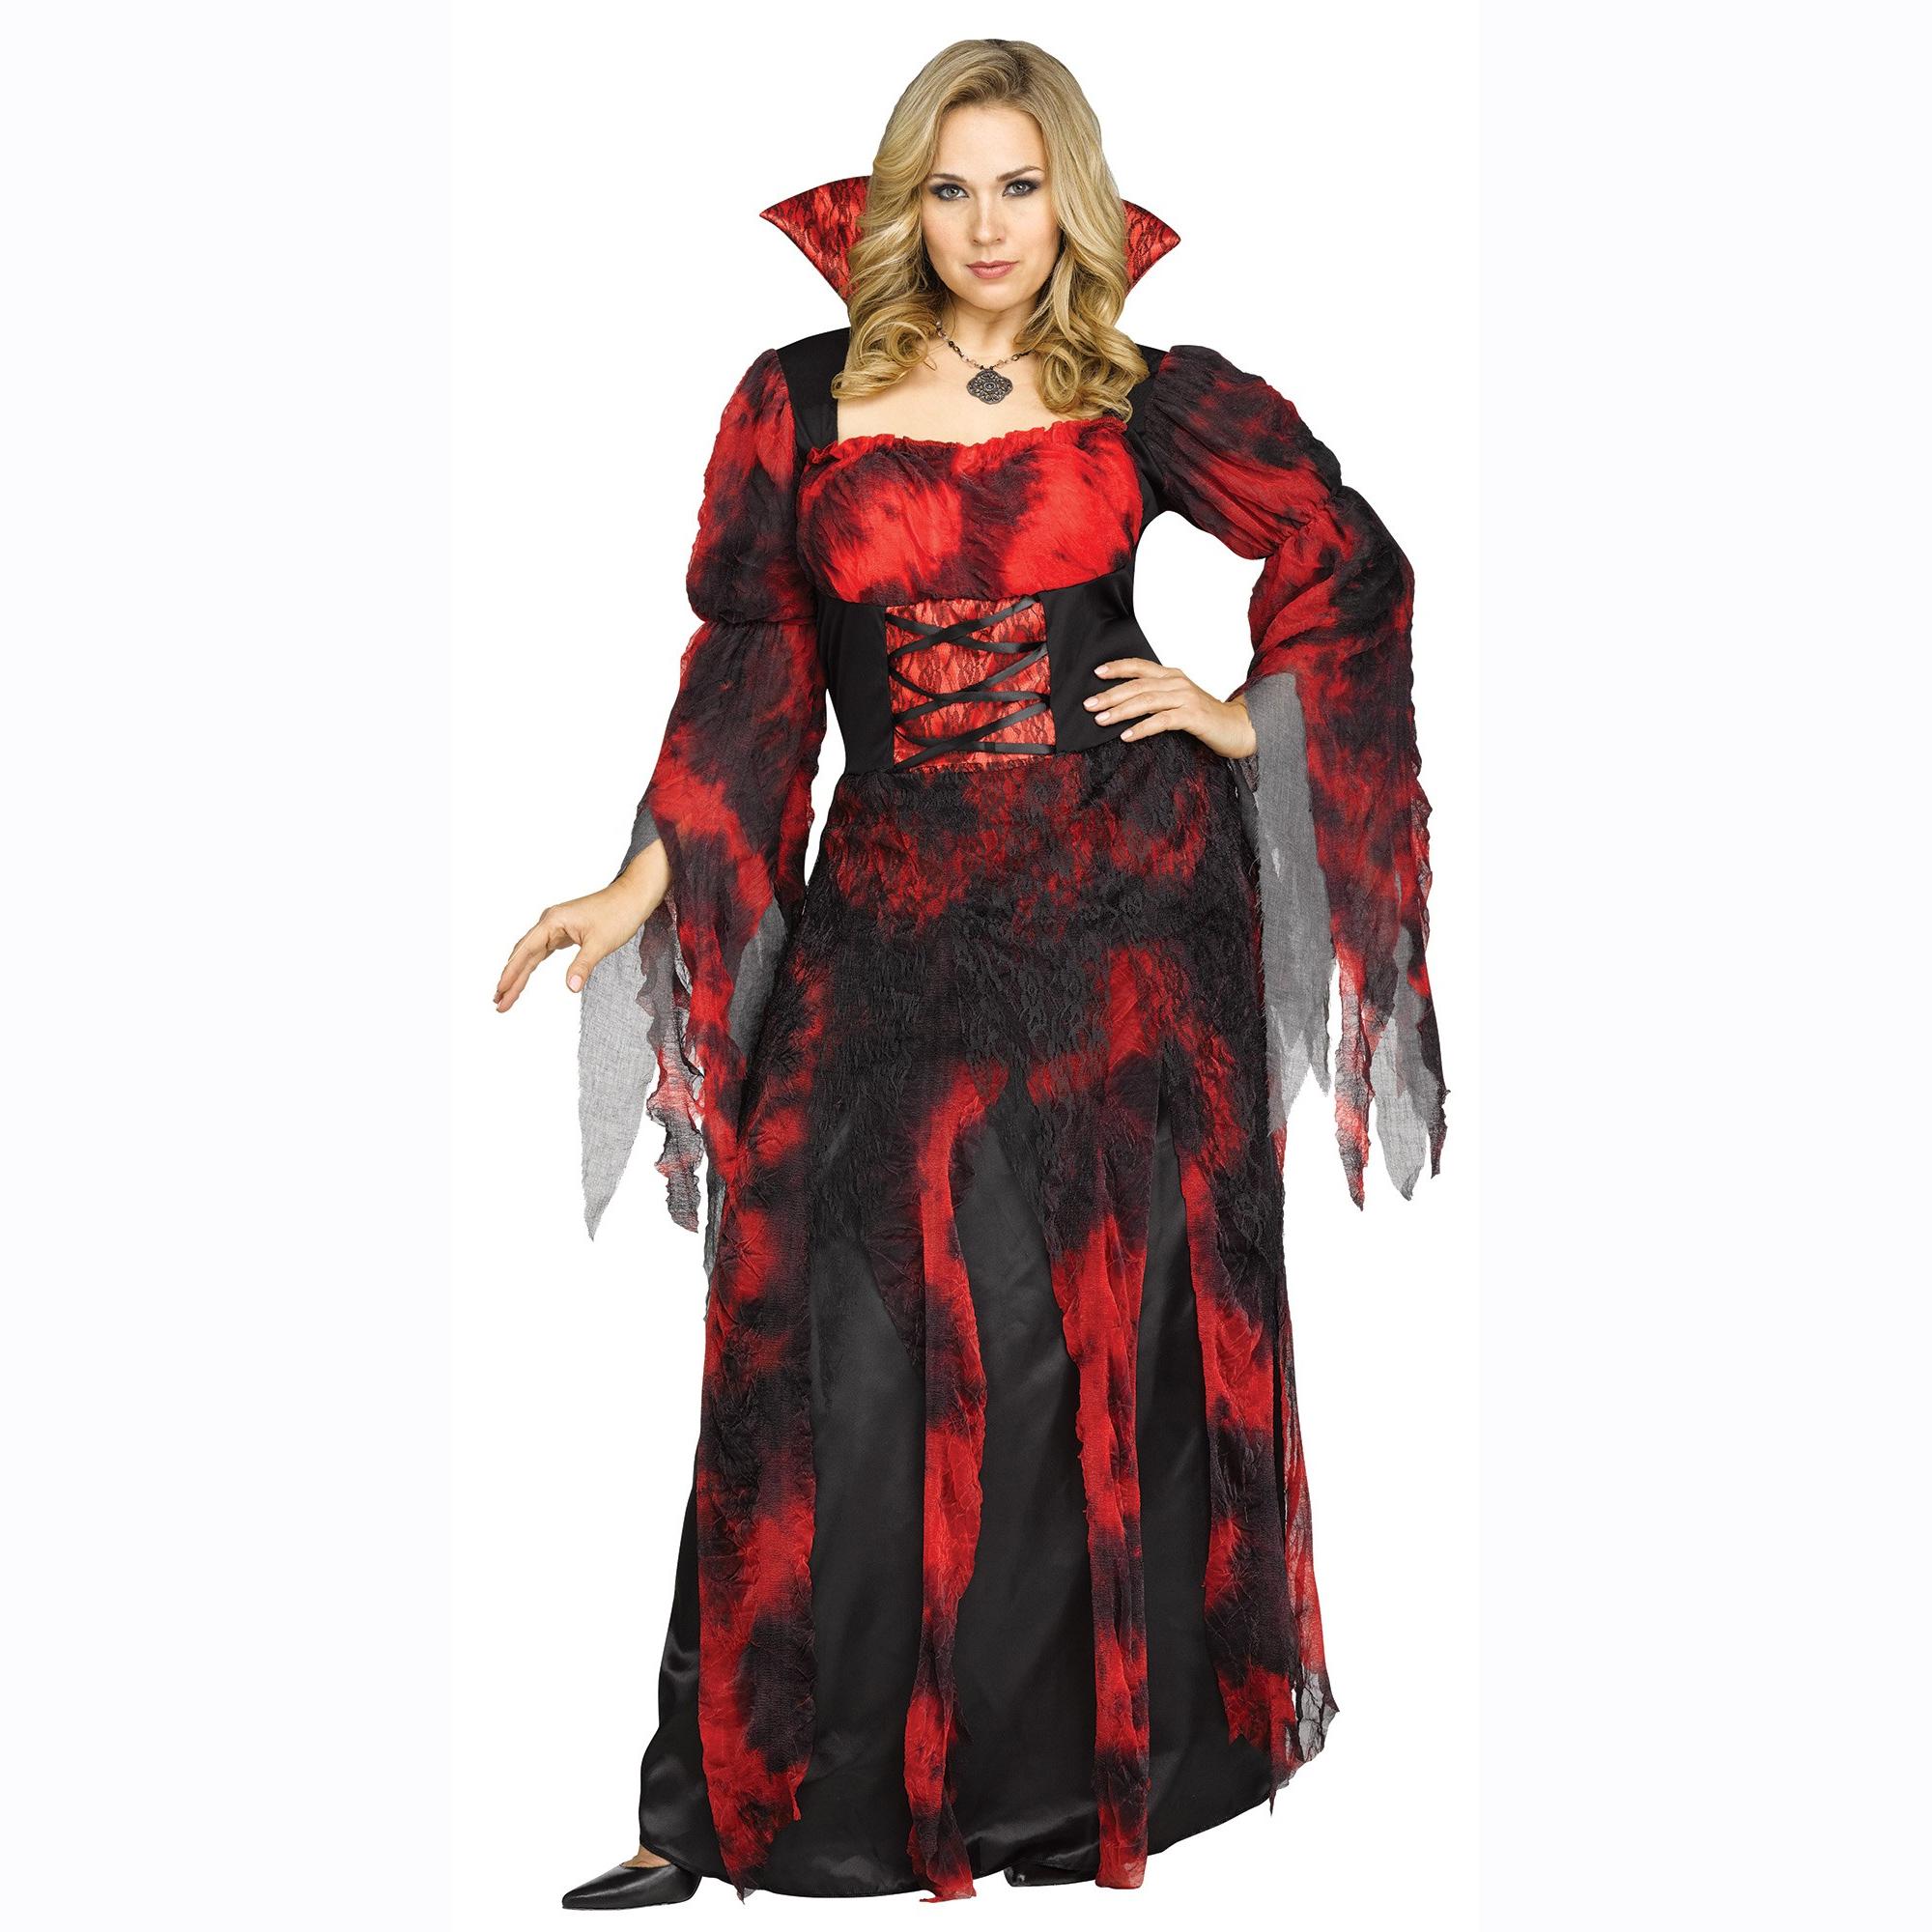 vampire countess costume - HD1027×1280